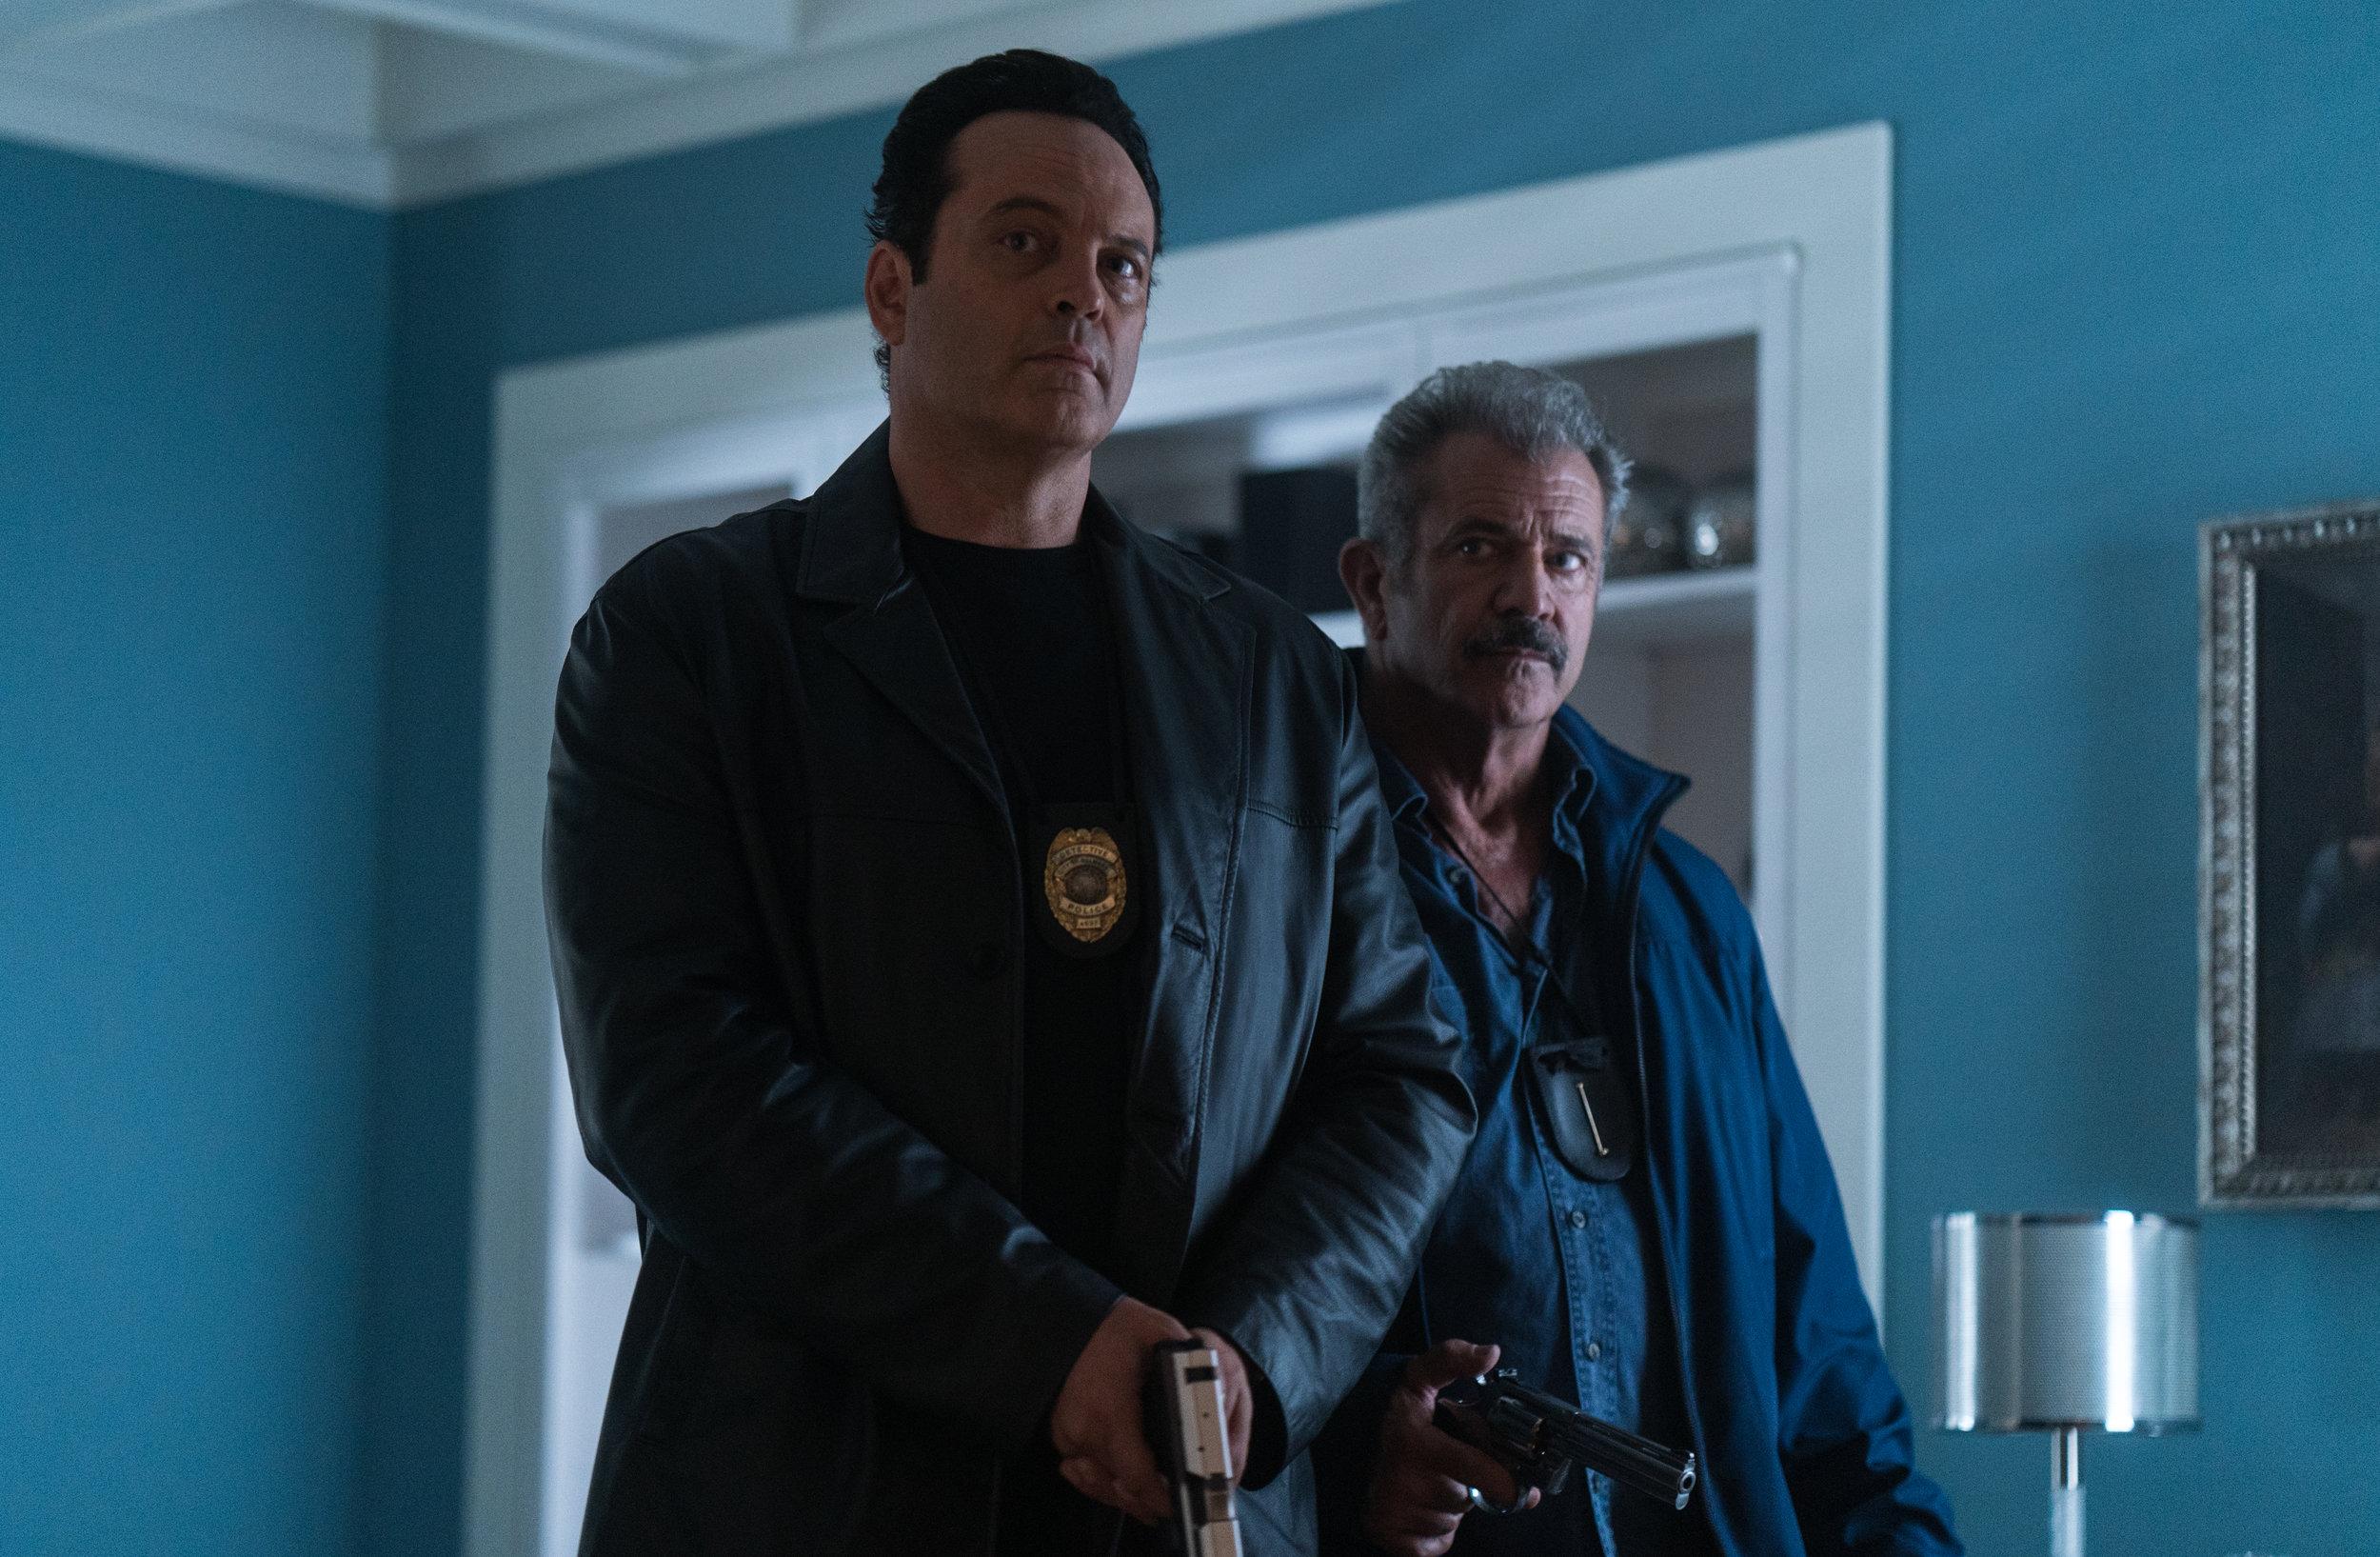 (Left to right) Vince Vaughn as Tony Lurasetti and Mel Gibson as Brett Ridgeman.